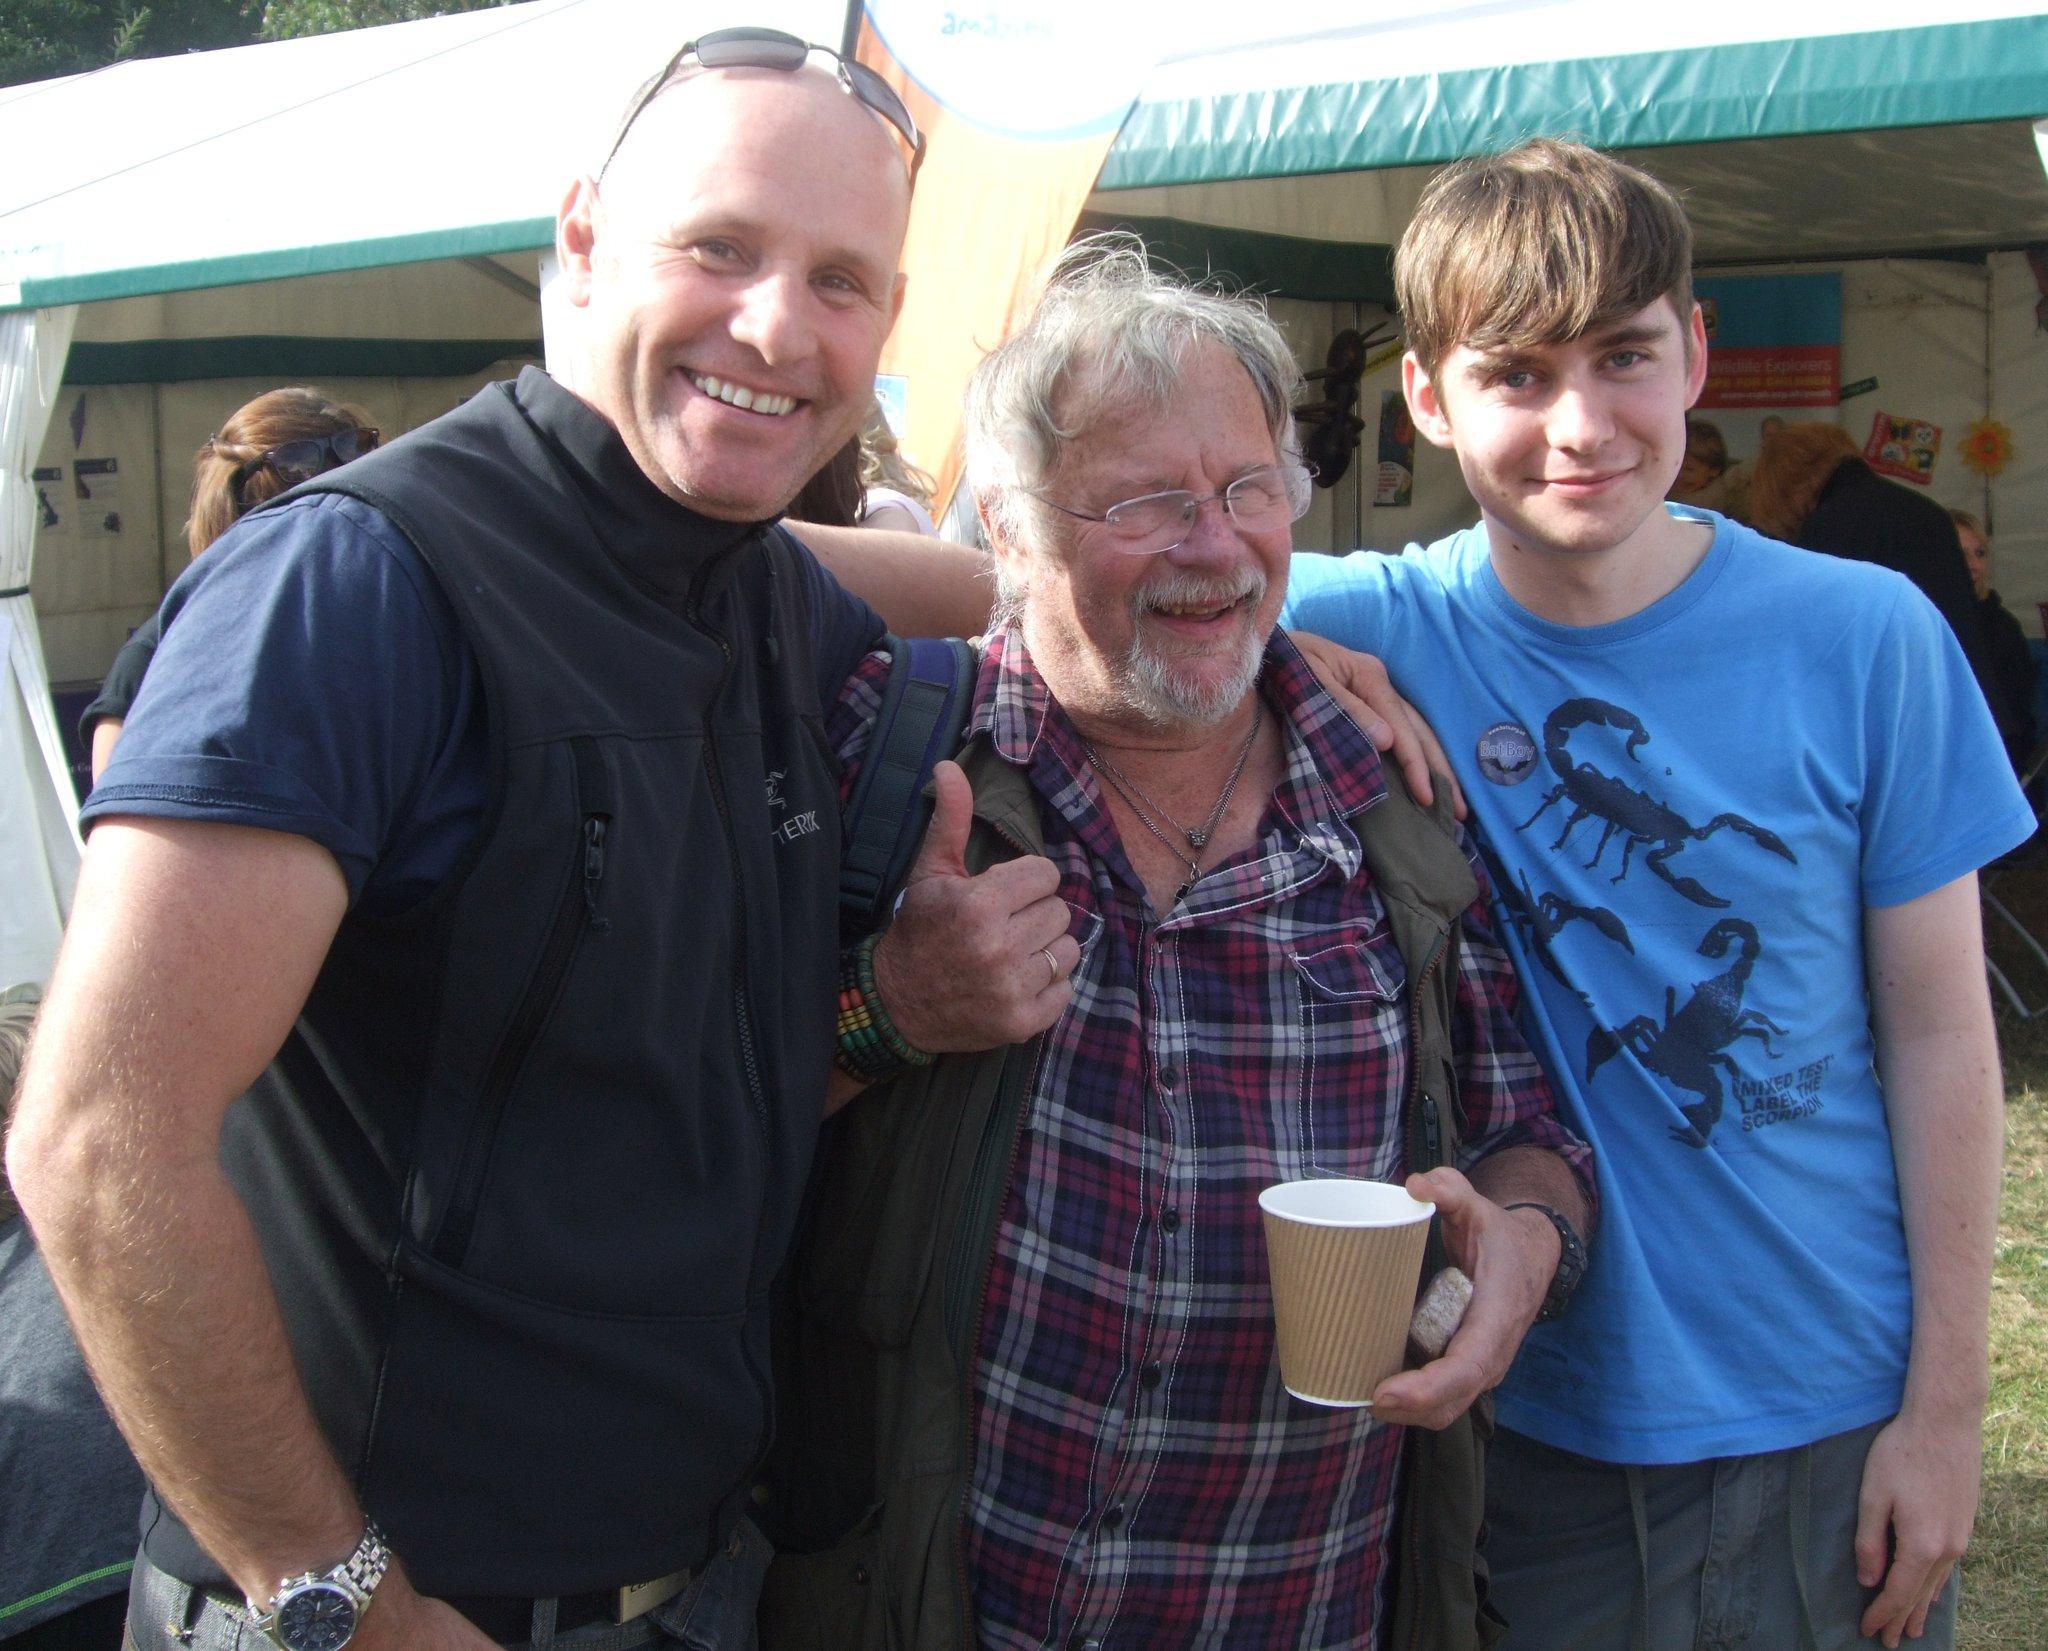 Birdfair 2011 - Mike Dilger, Bill Oddie & Adam Canning